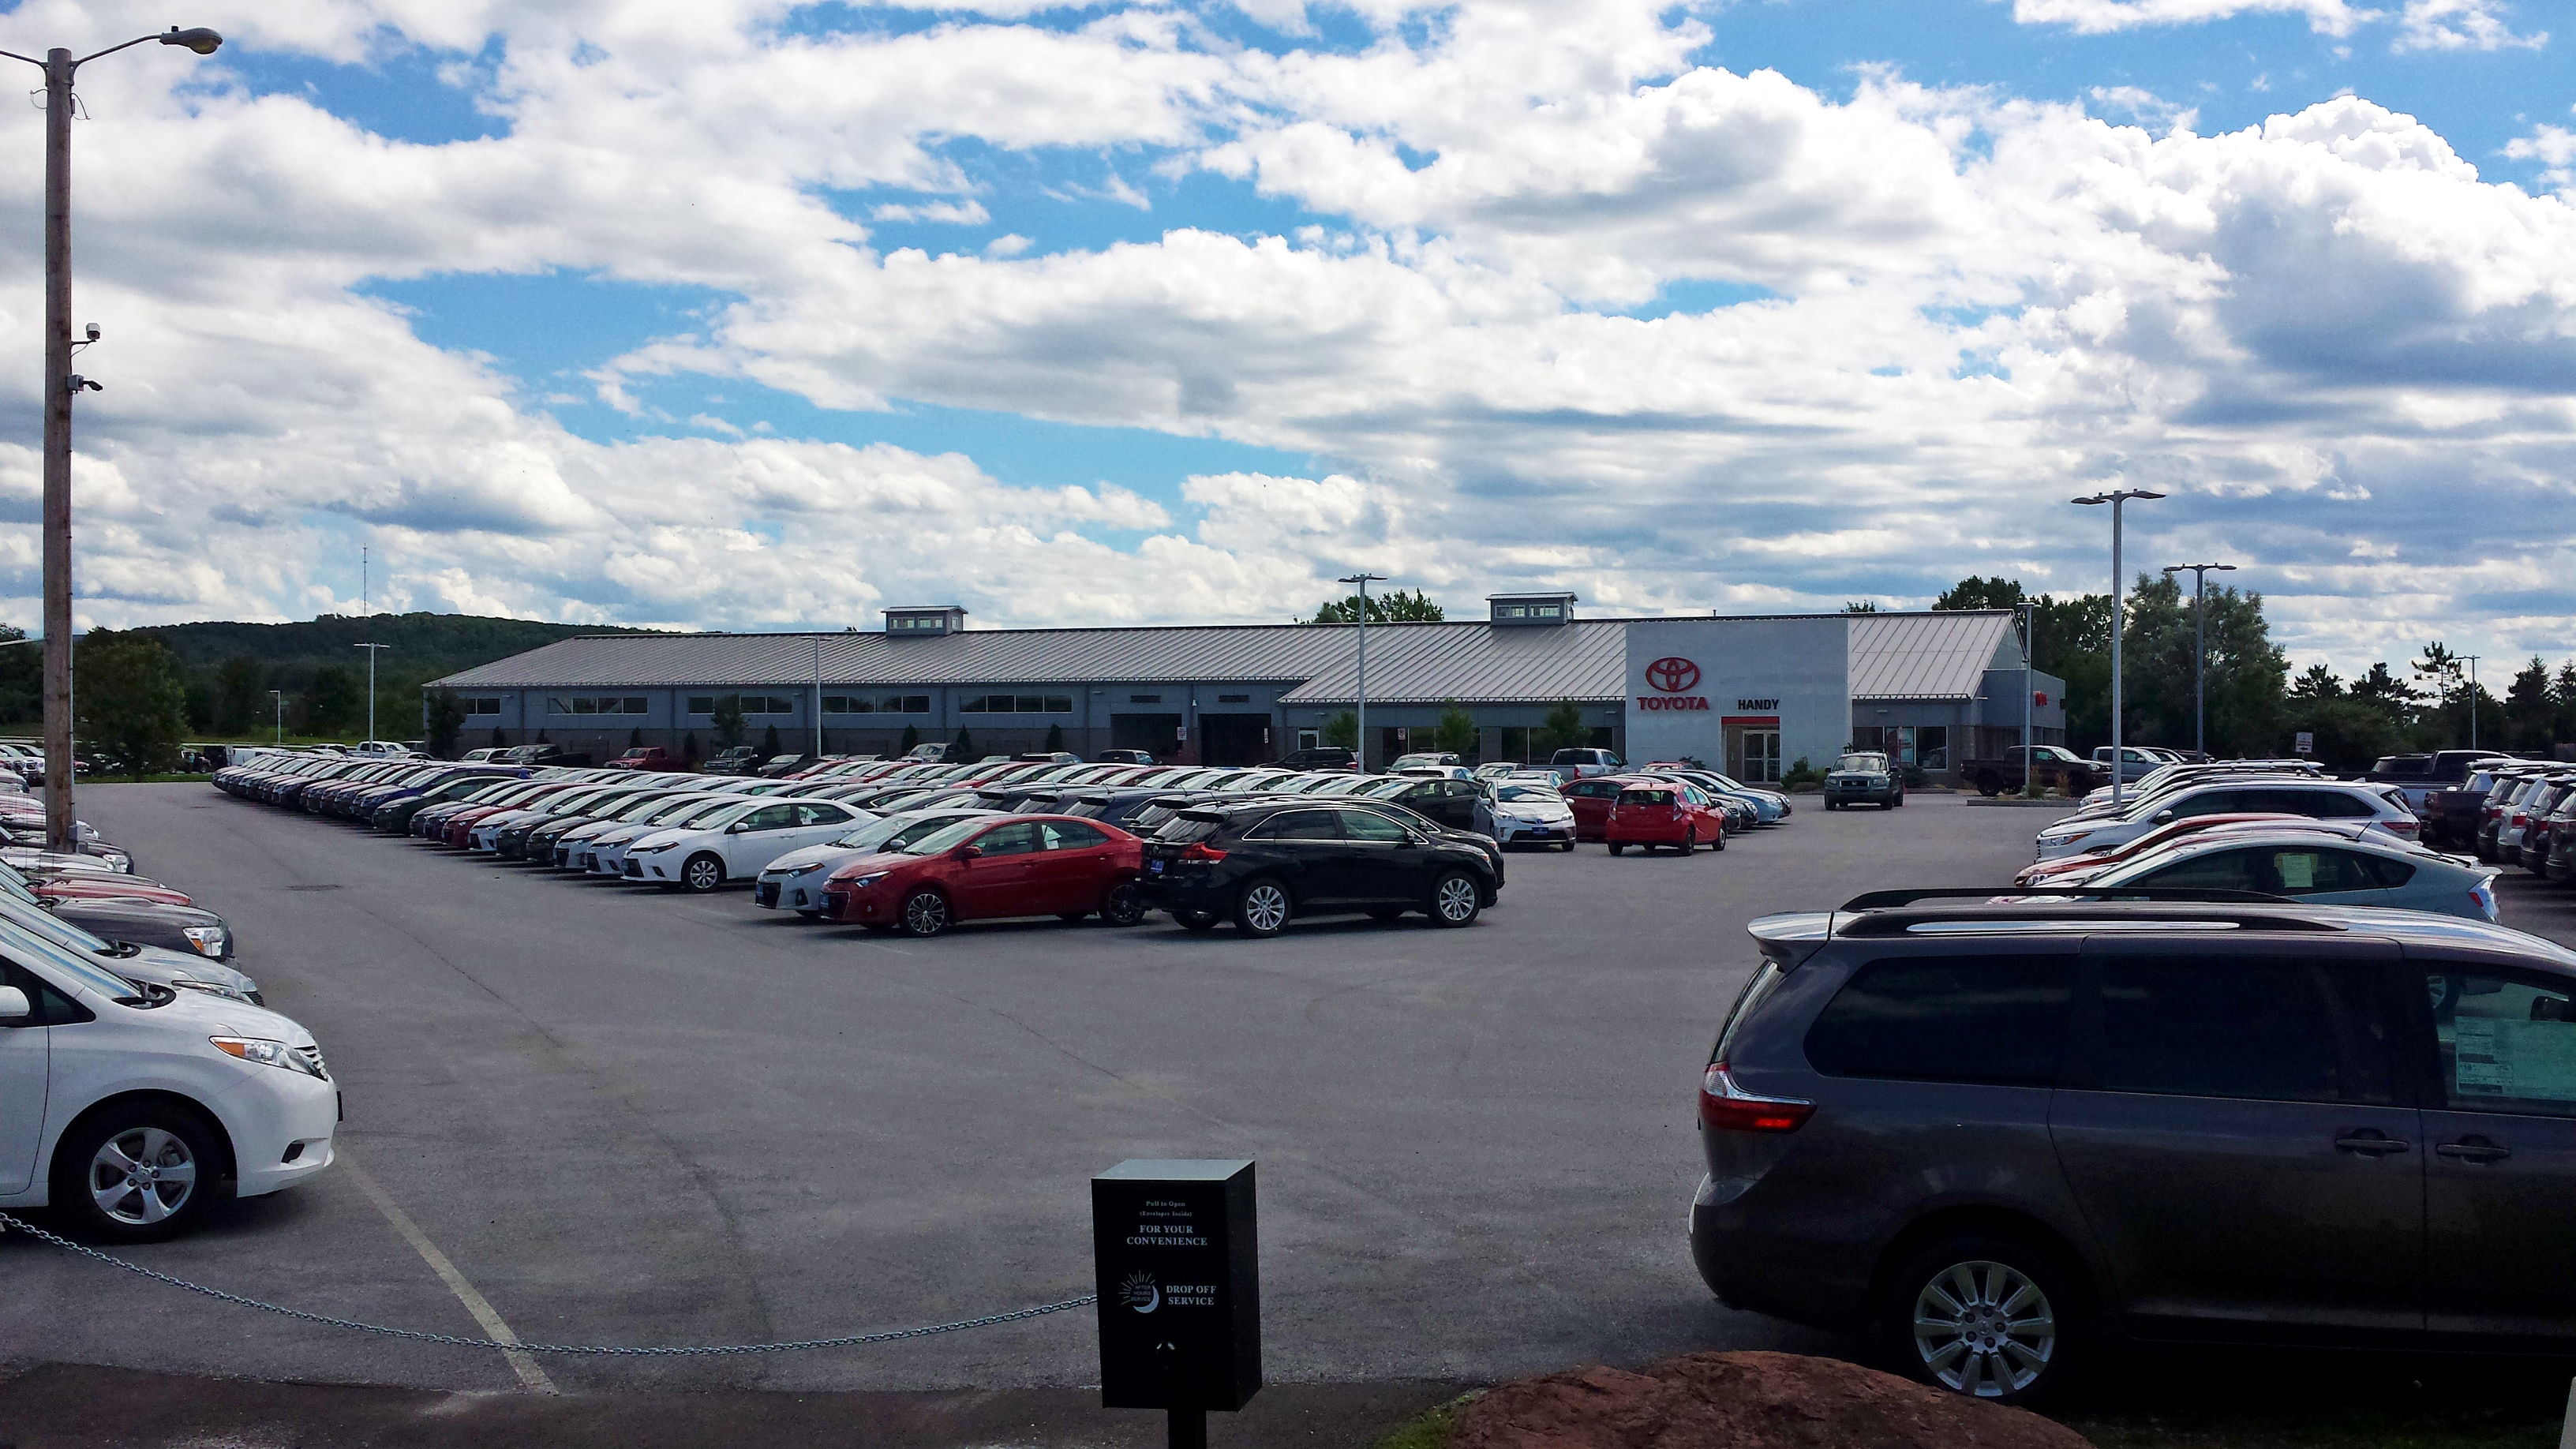 Toyota Burlington Vt News Of New Car Release